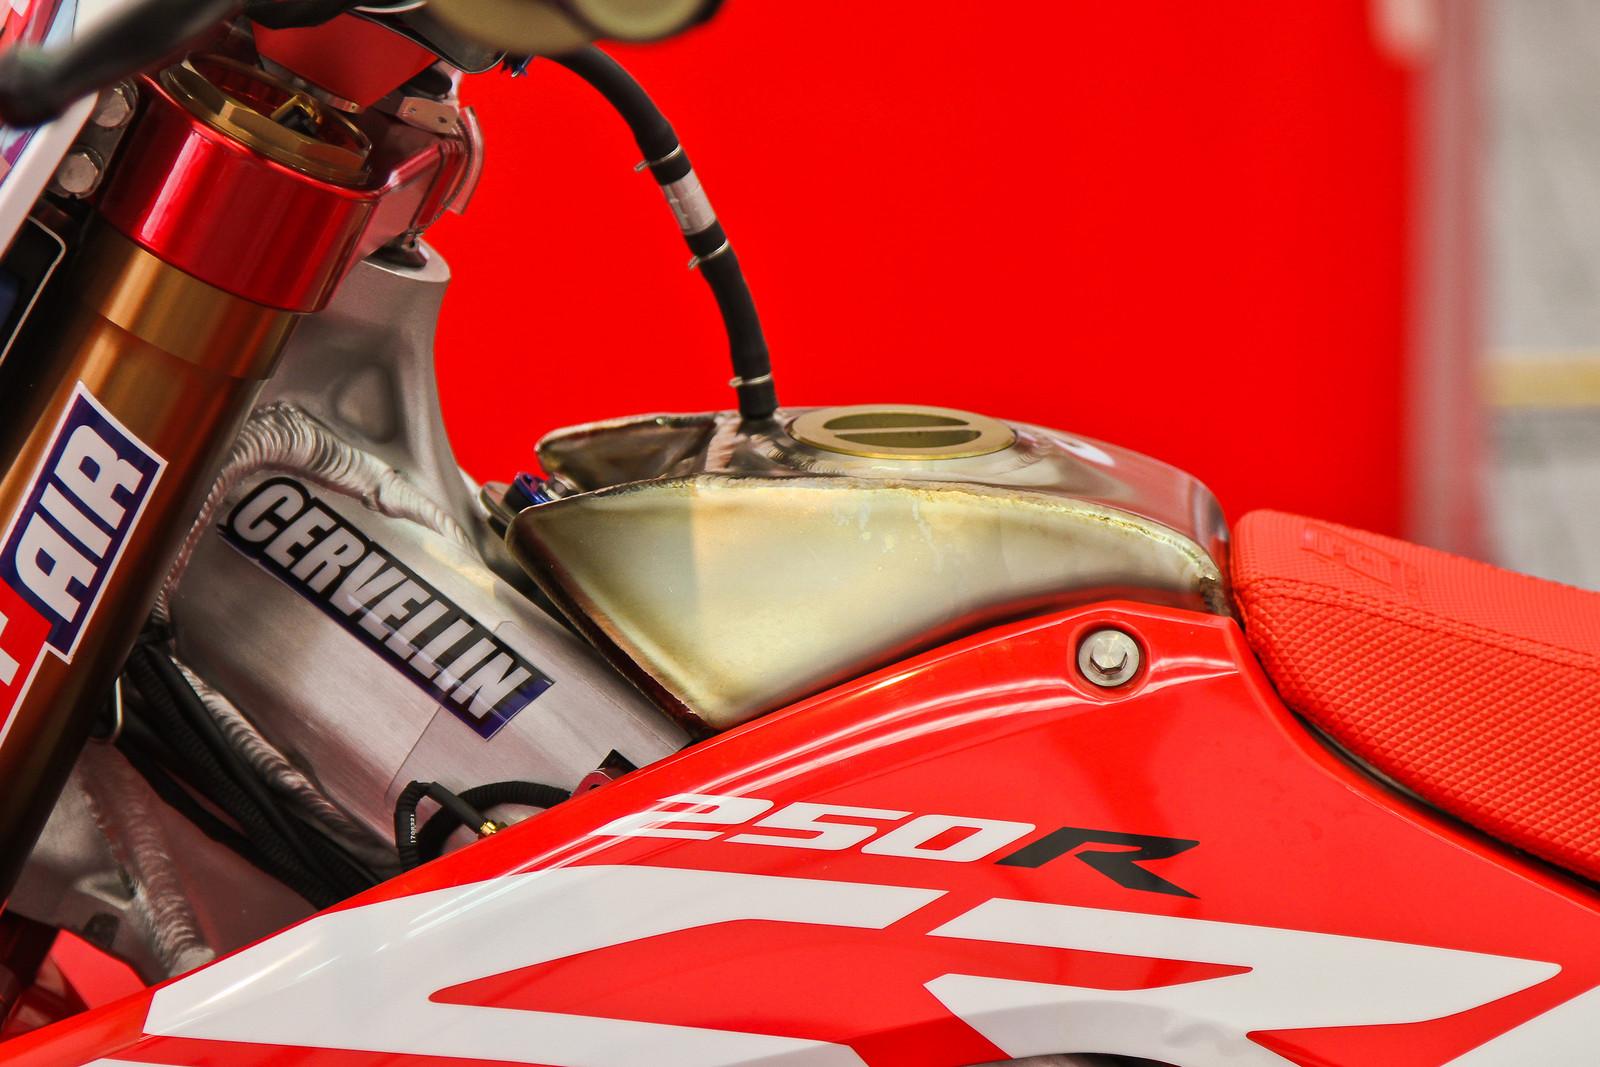 2018 Honda CRF250RW - Titanium Fuel Tank - ayearinmx - Motocross Pictures - Vital MX